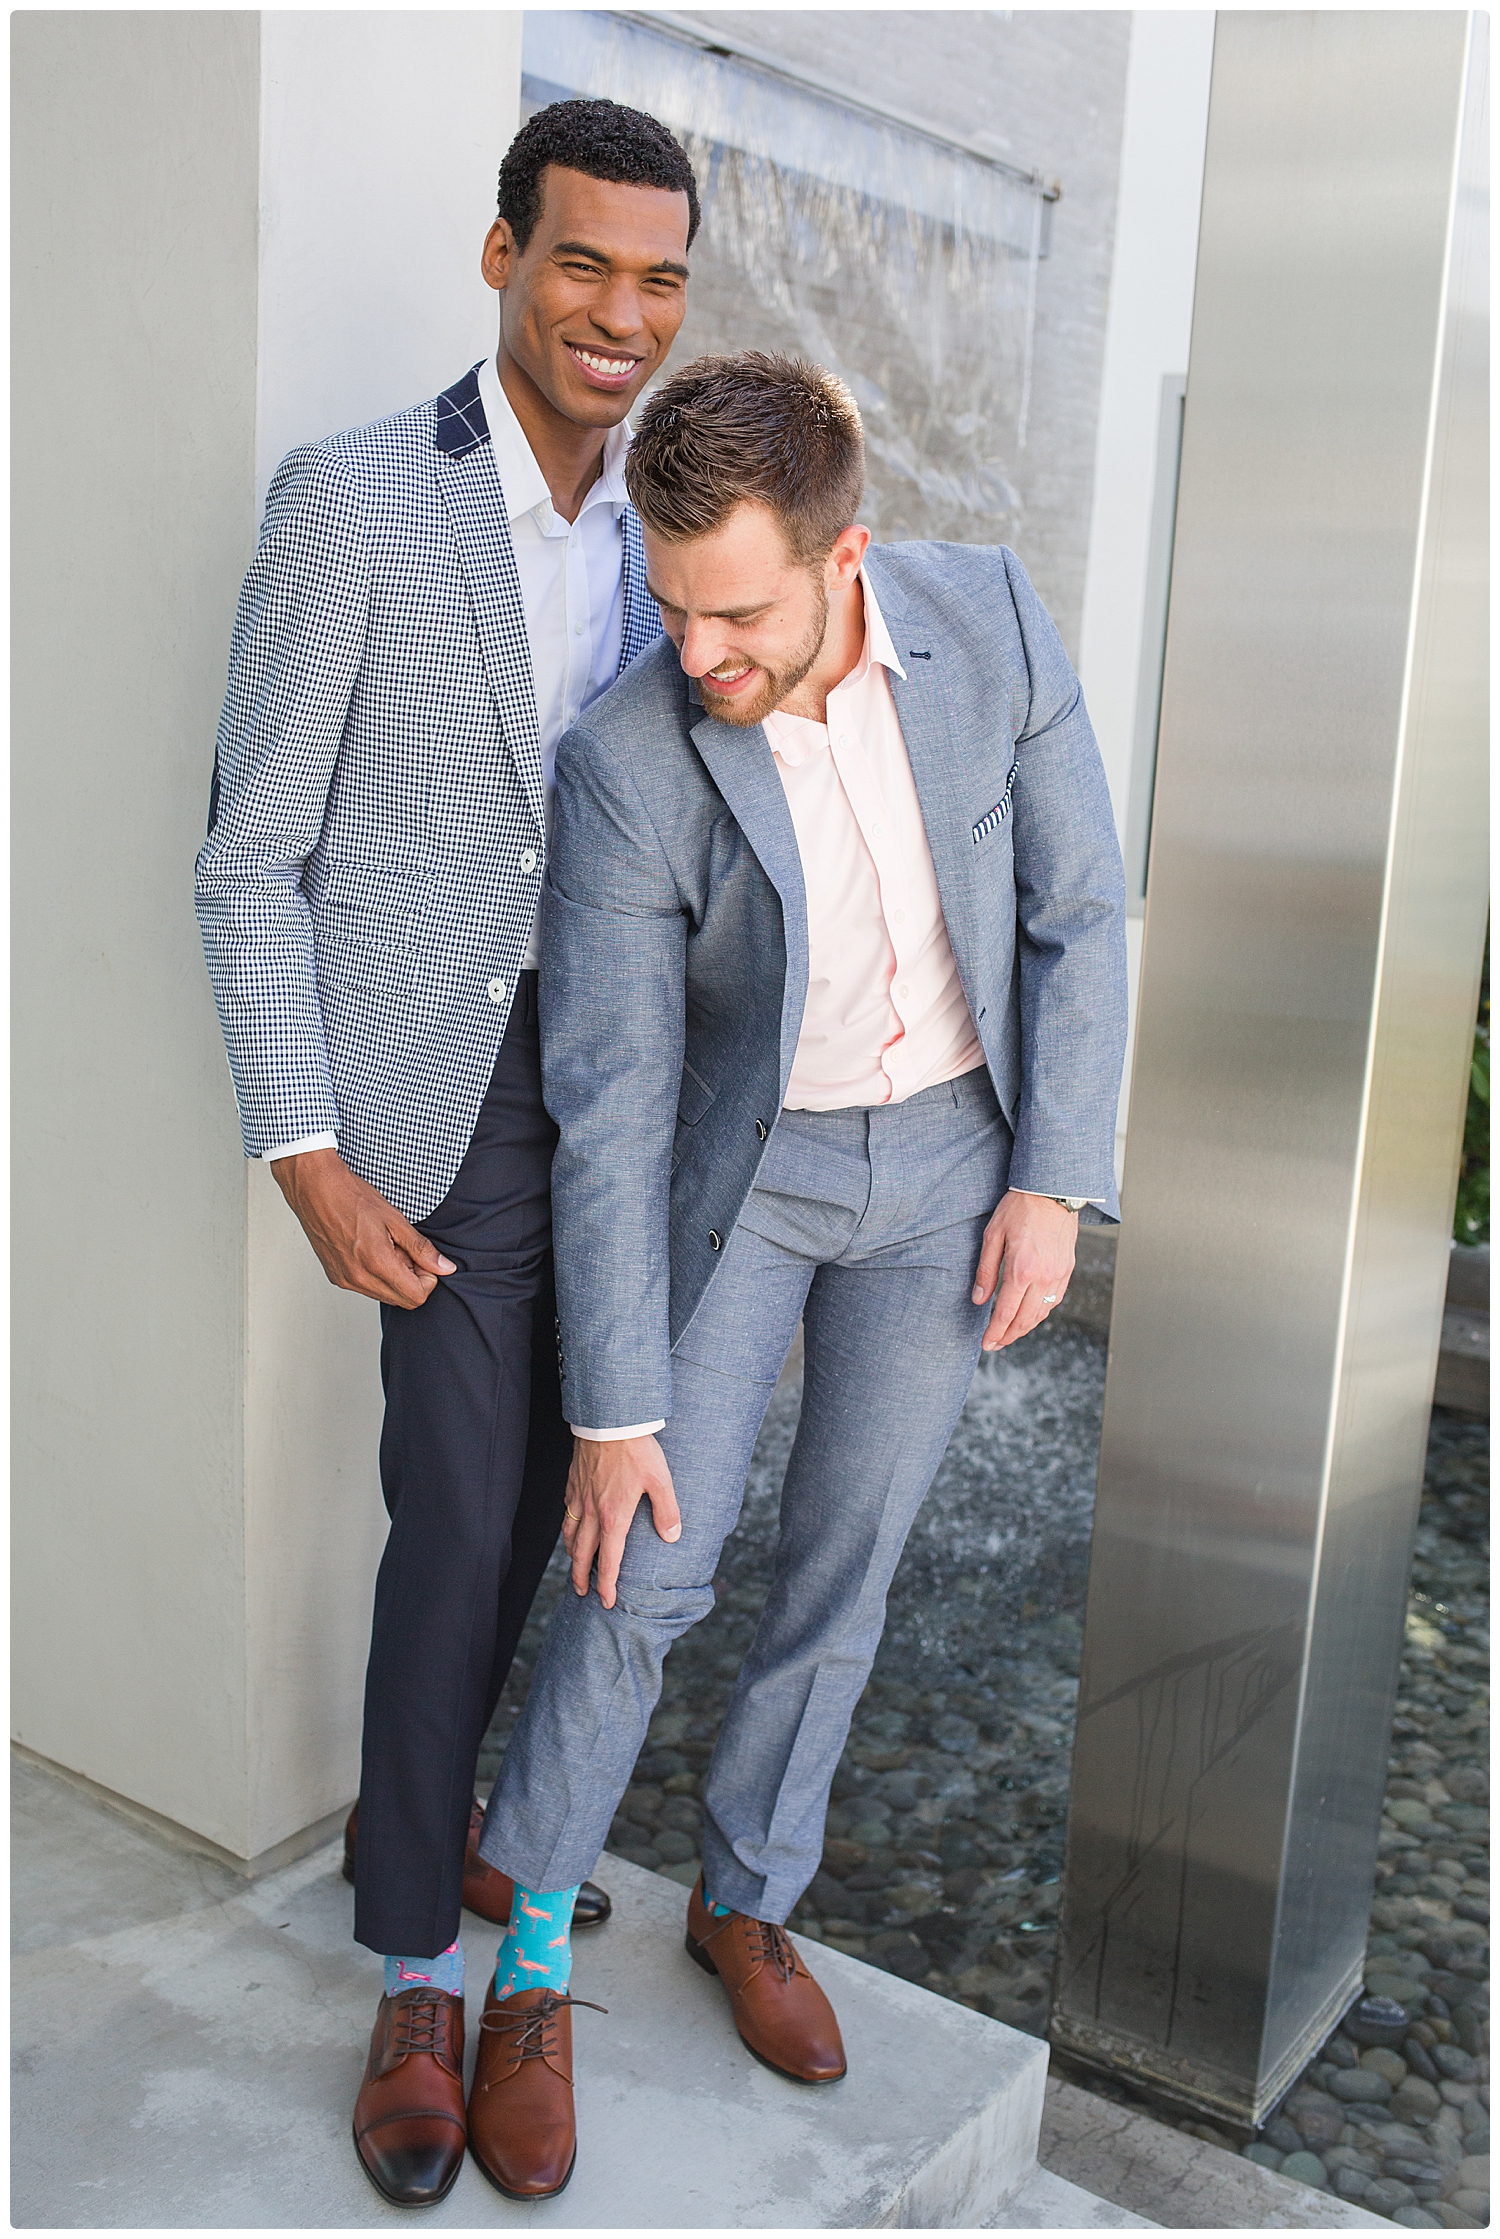 042119_Bryan+Nick_anniversary styled shoot_Renoda Campbell Photography_LGBT photoshoot_0095.jpg